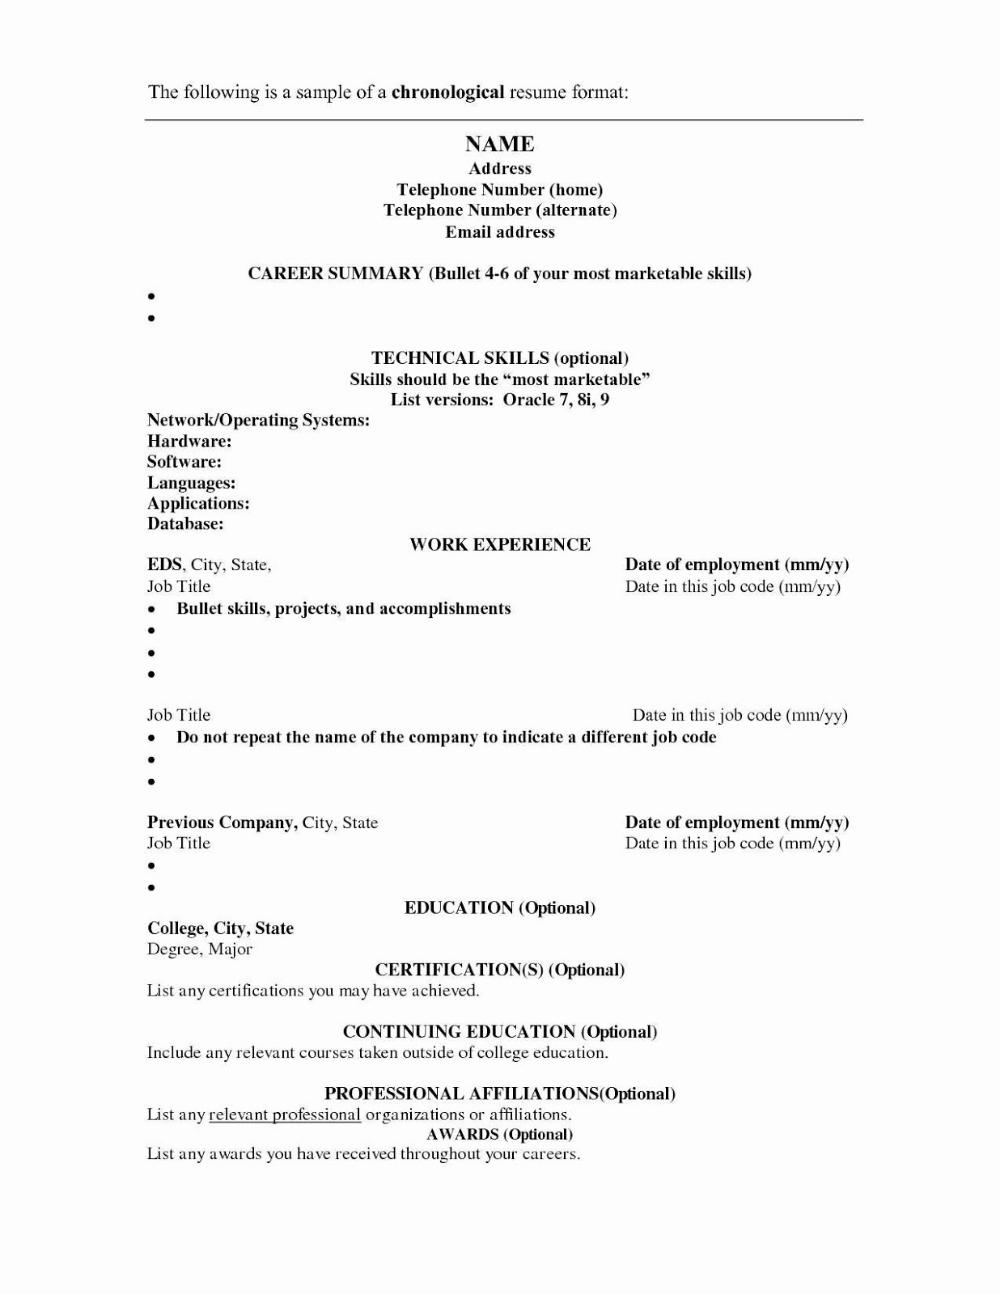 Best Resume Formats 2020 Academic resume sample, academic resume sample pdf, Academic